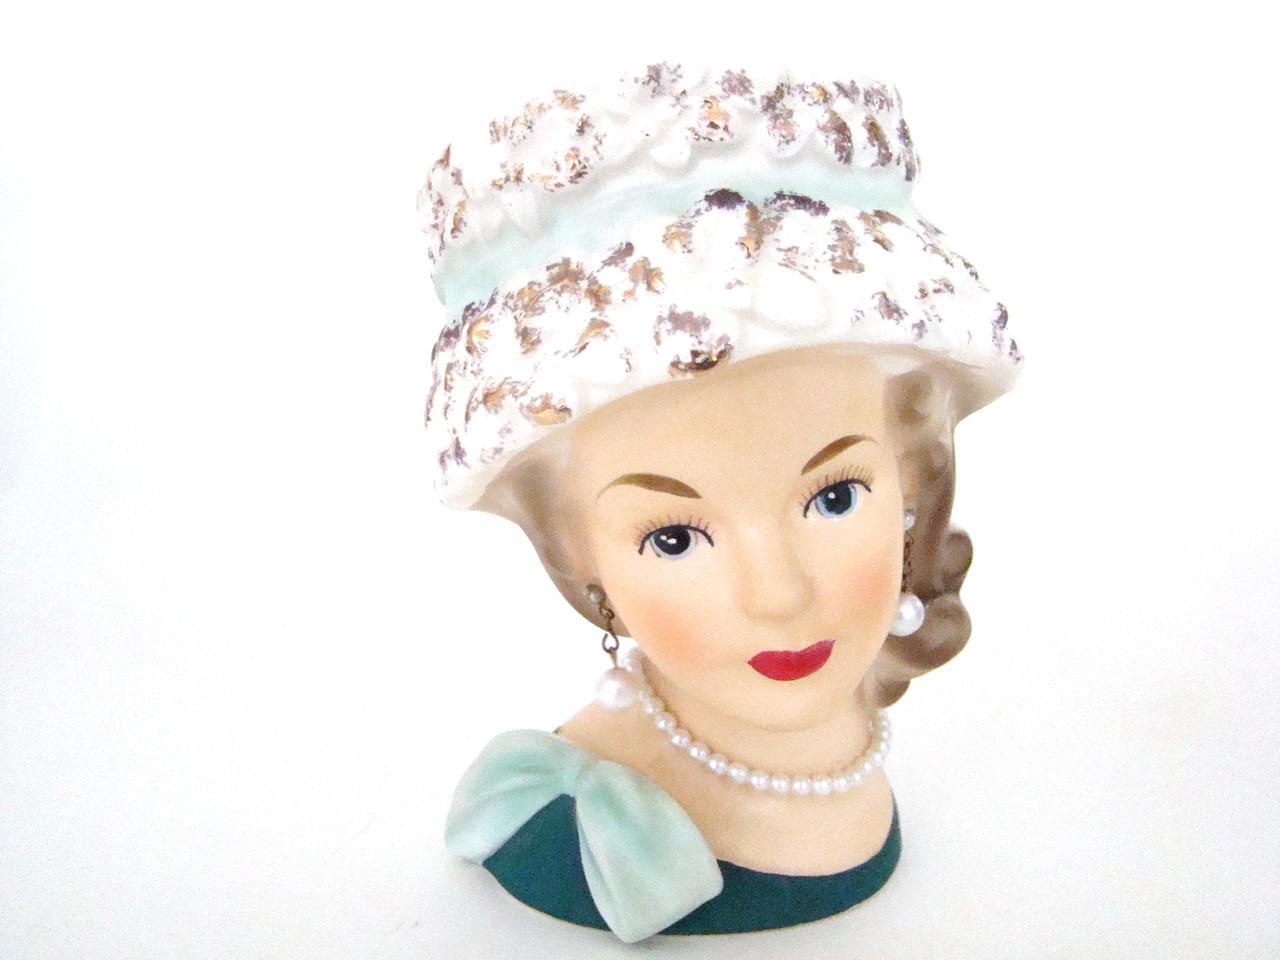 Vintage Lady Head Vase Relpo K1517 in Sculpted Hat